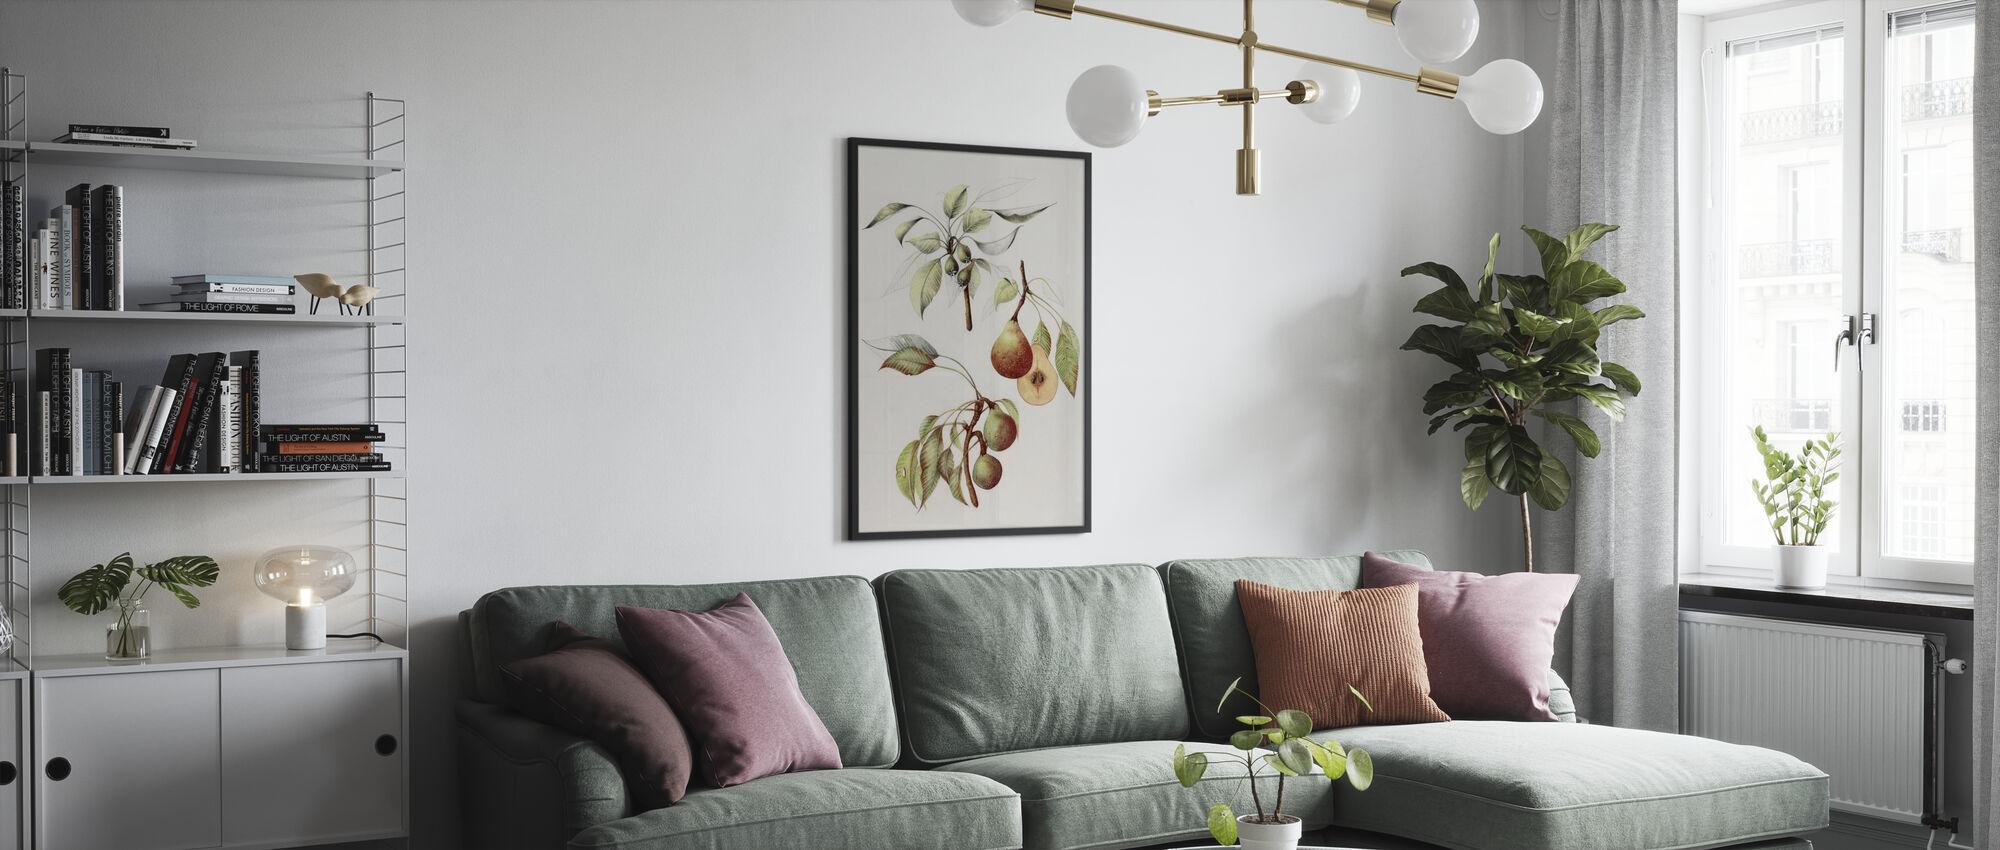 Pine Street Pears - Poster - Living Room